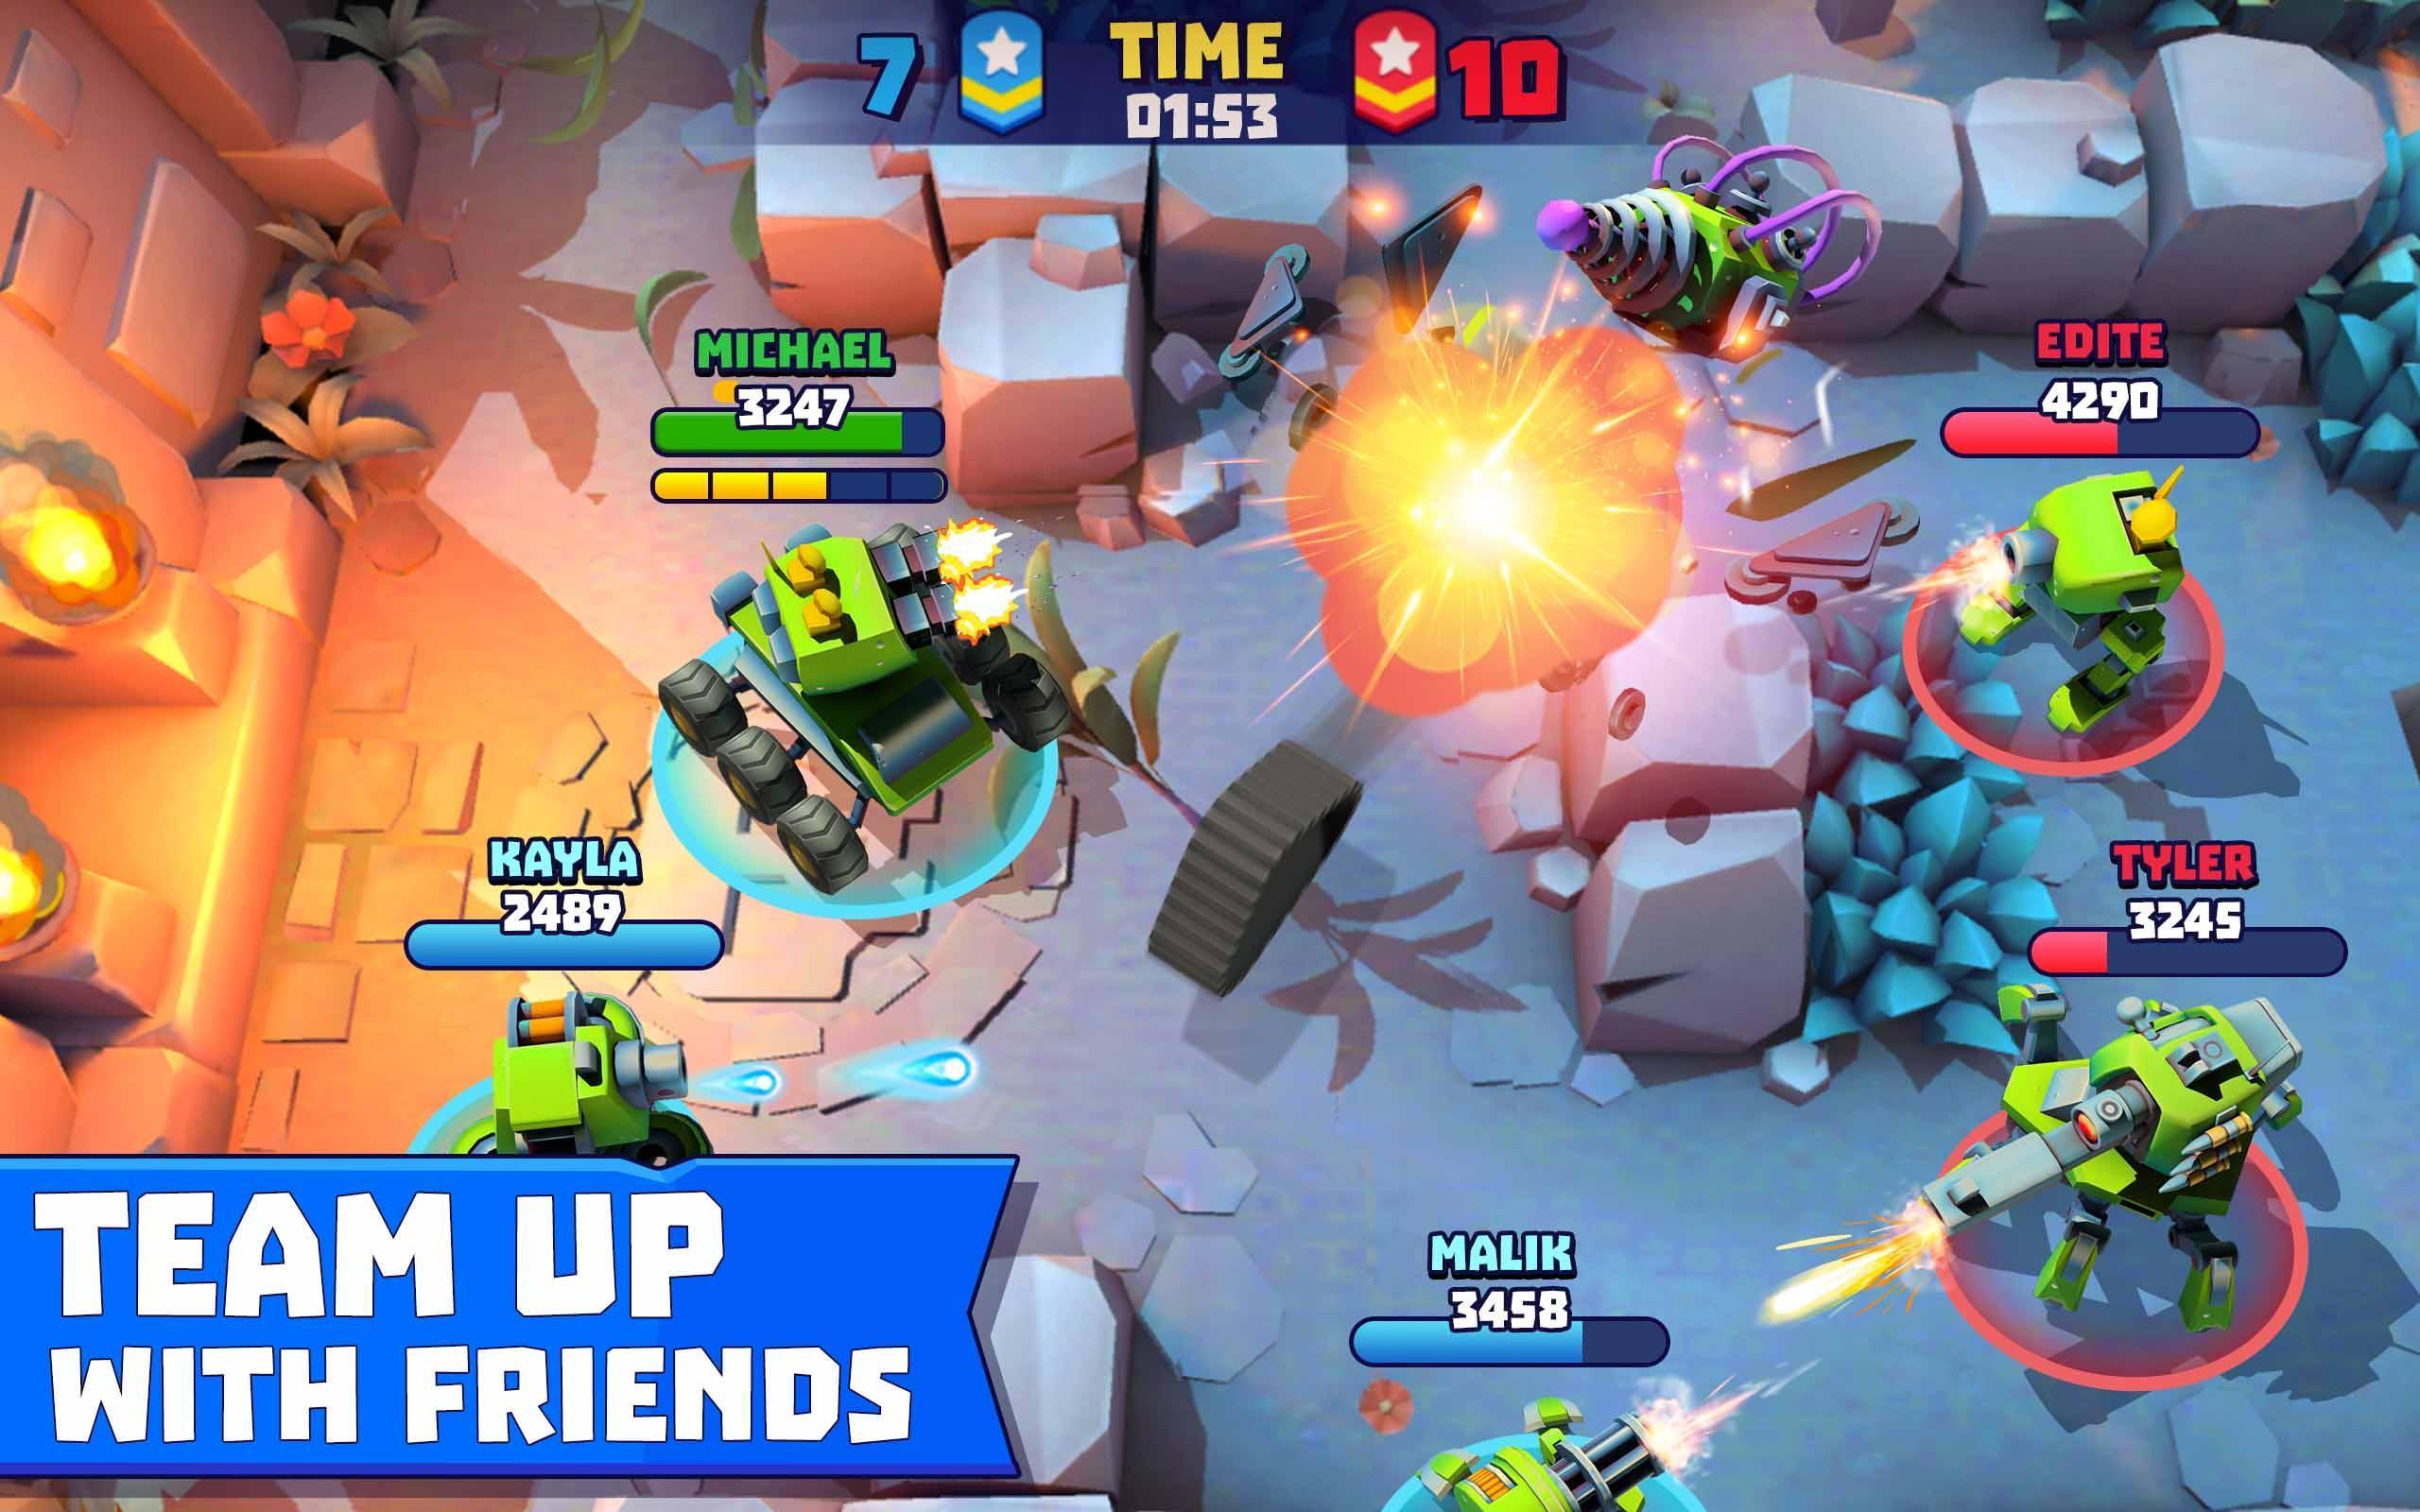 Tanks A Lot! - Realtime Multiplayer Battle Arena 2.56 Screenshot 11